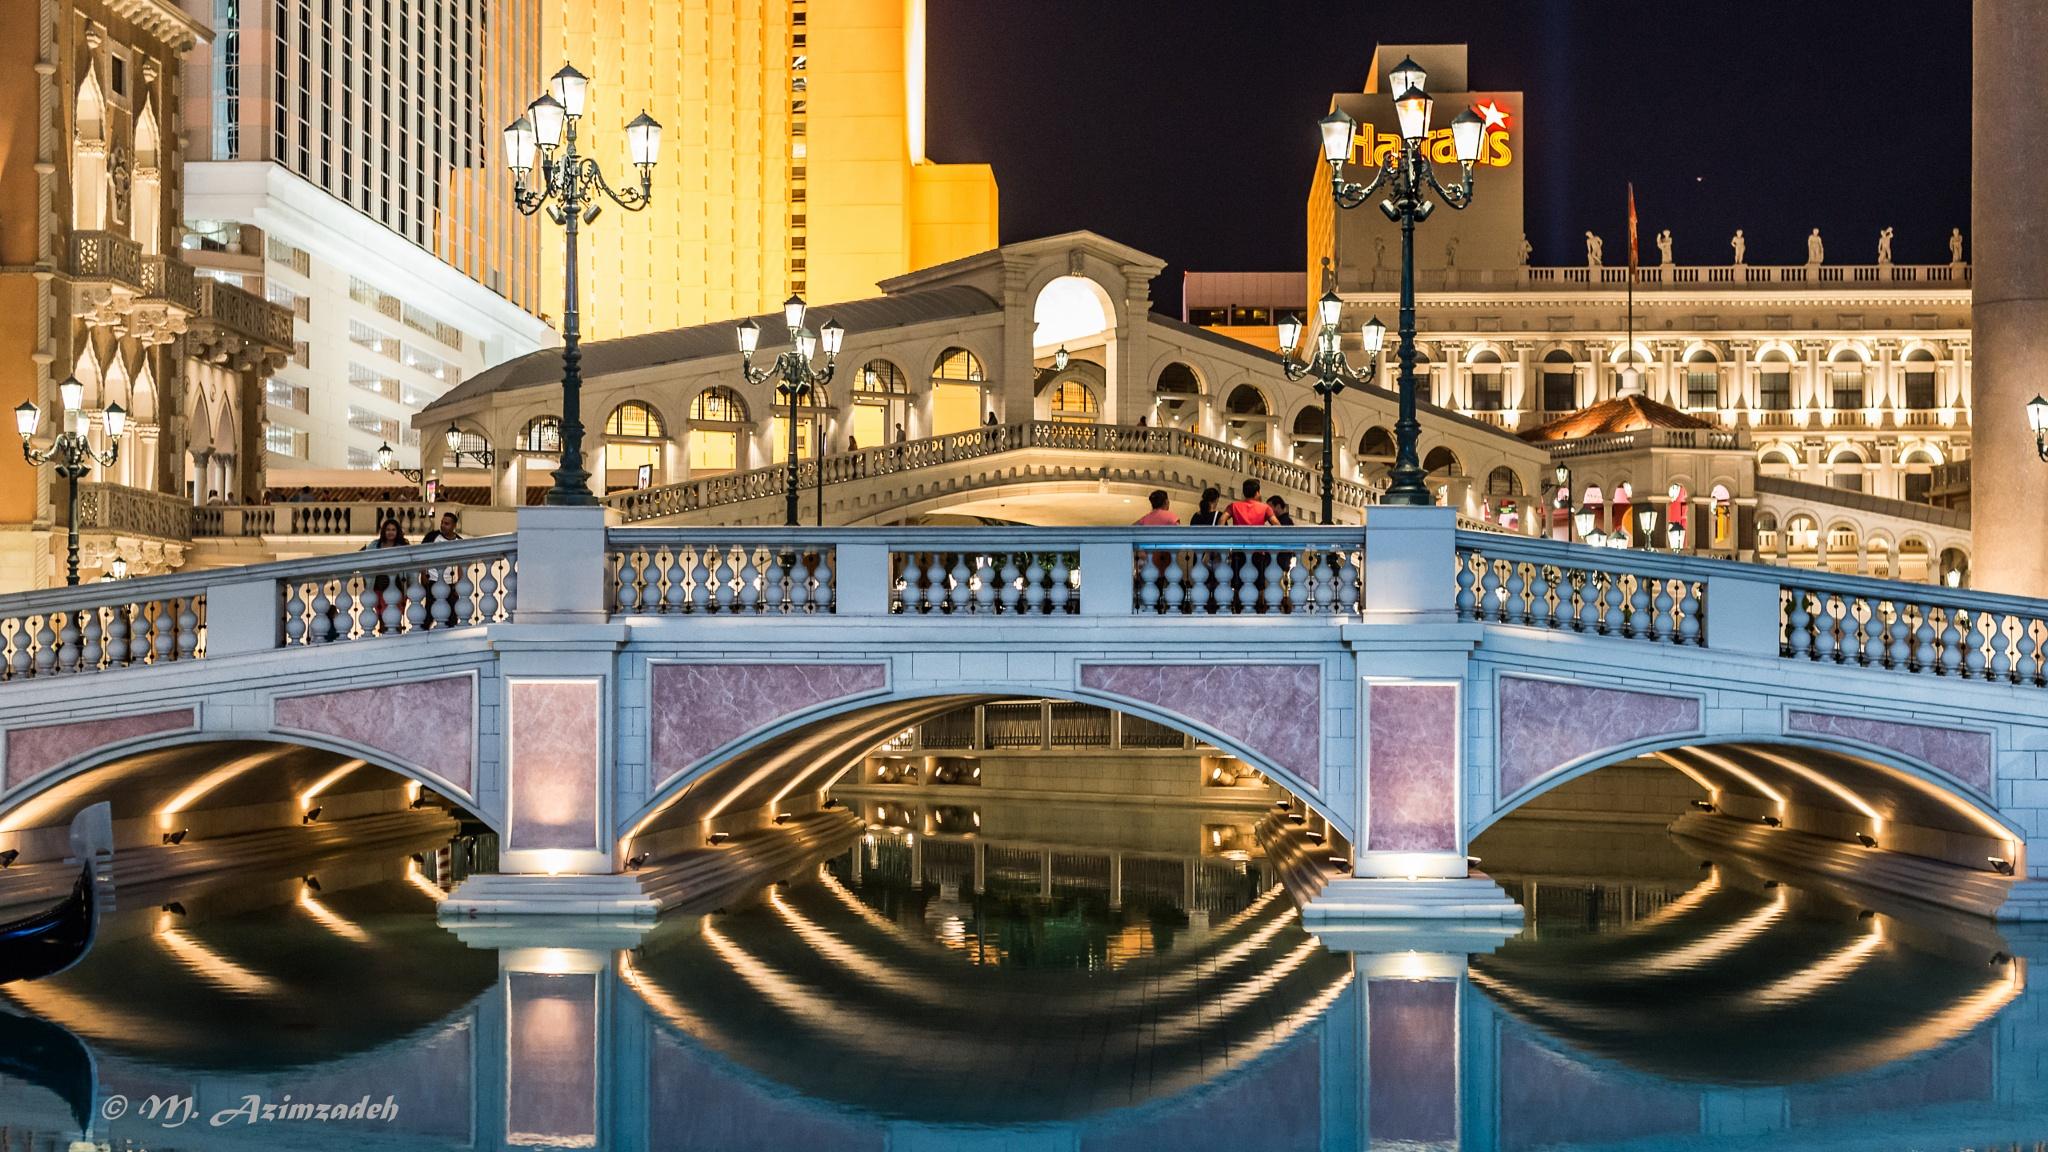 Las Vegas, USA by Mohammed Azimzadeh